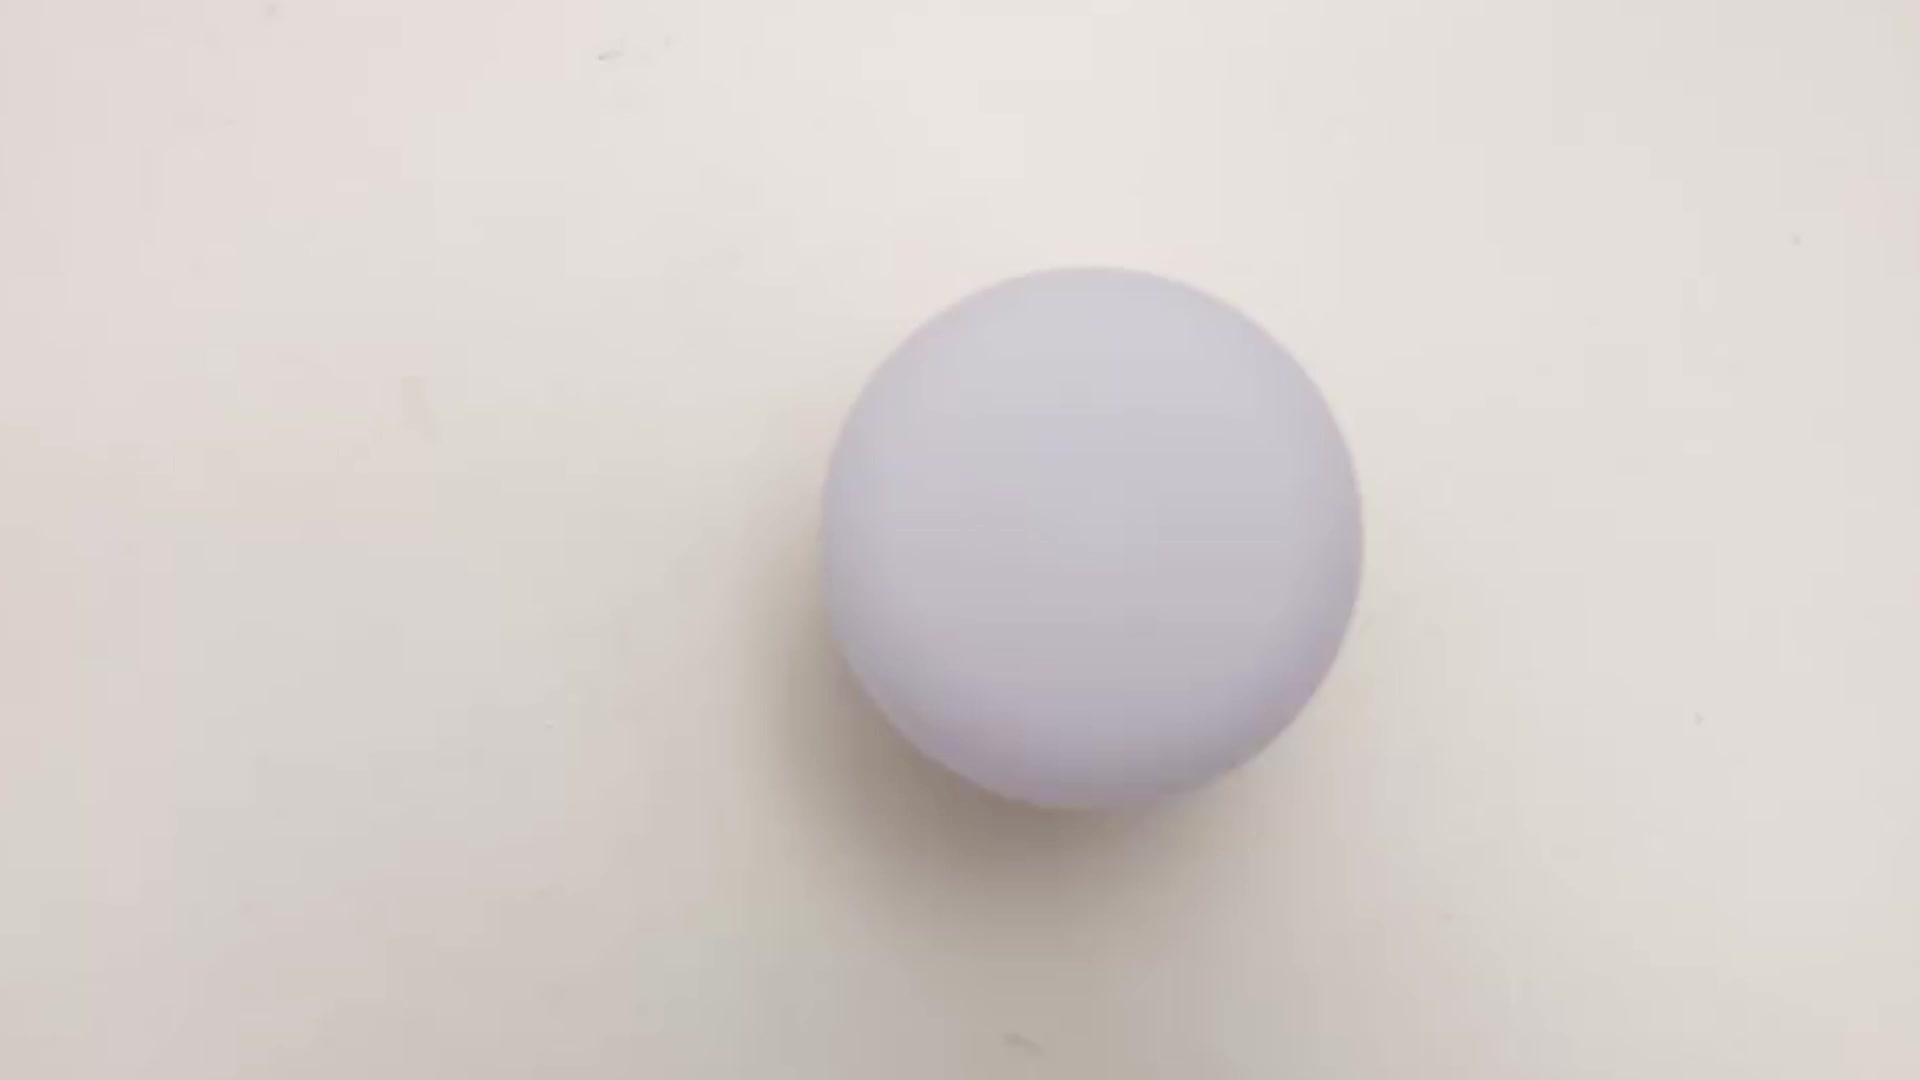 Ningbo wireless LED Touch Light Night puck light for Baby Children Kids Room Bedside Bedroom Living Room